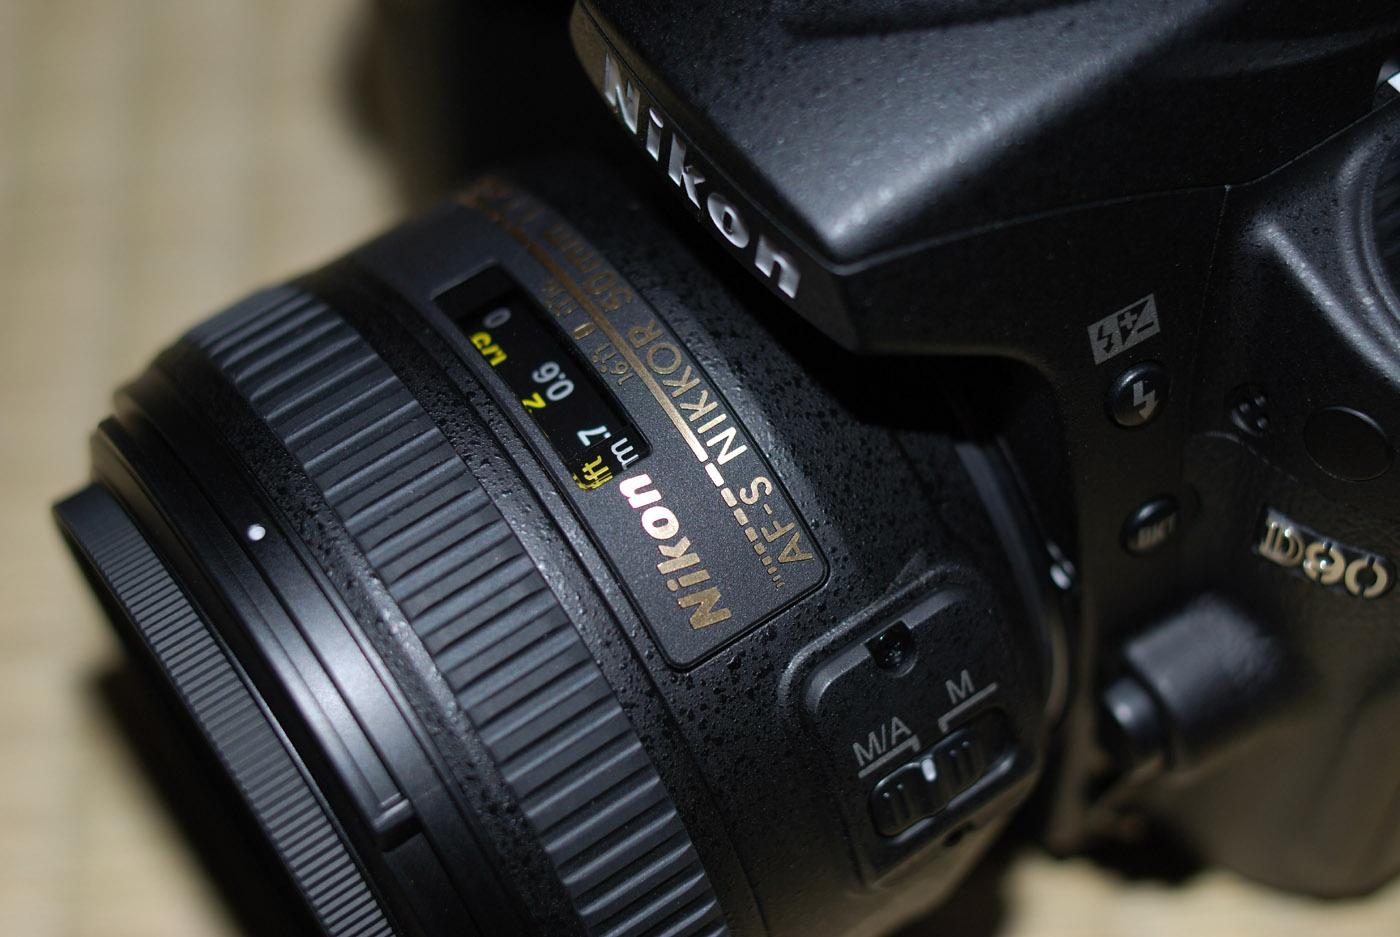 Nikon D90とAF-S NIKKOR 50mm F1.4Gのくみあわせ